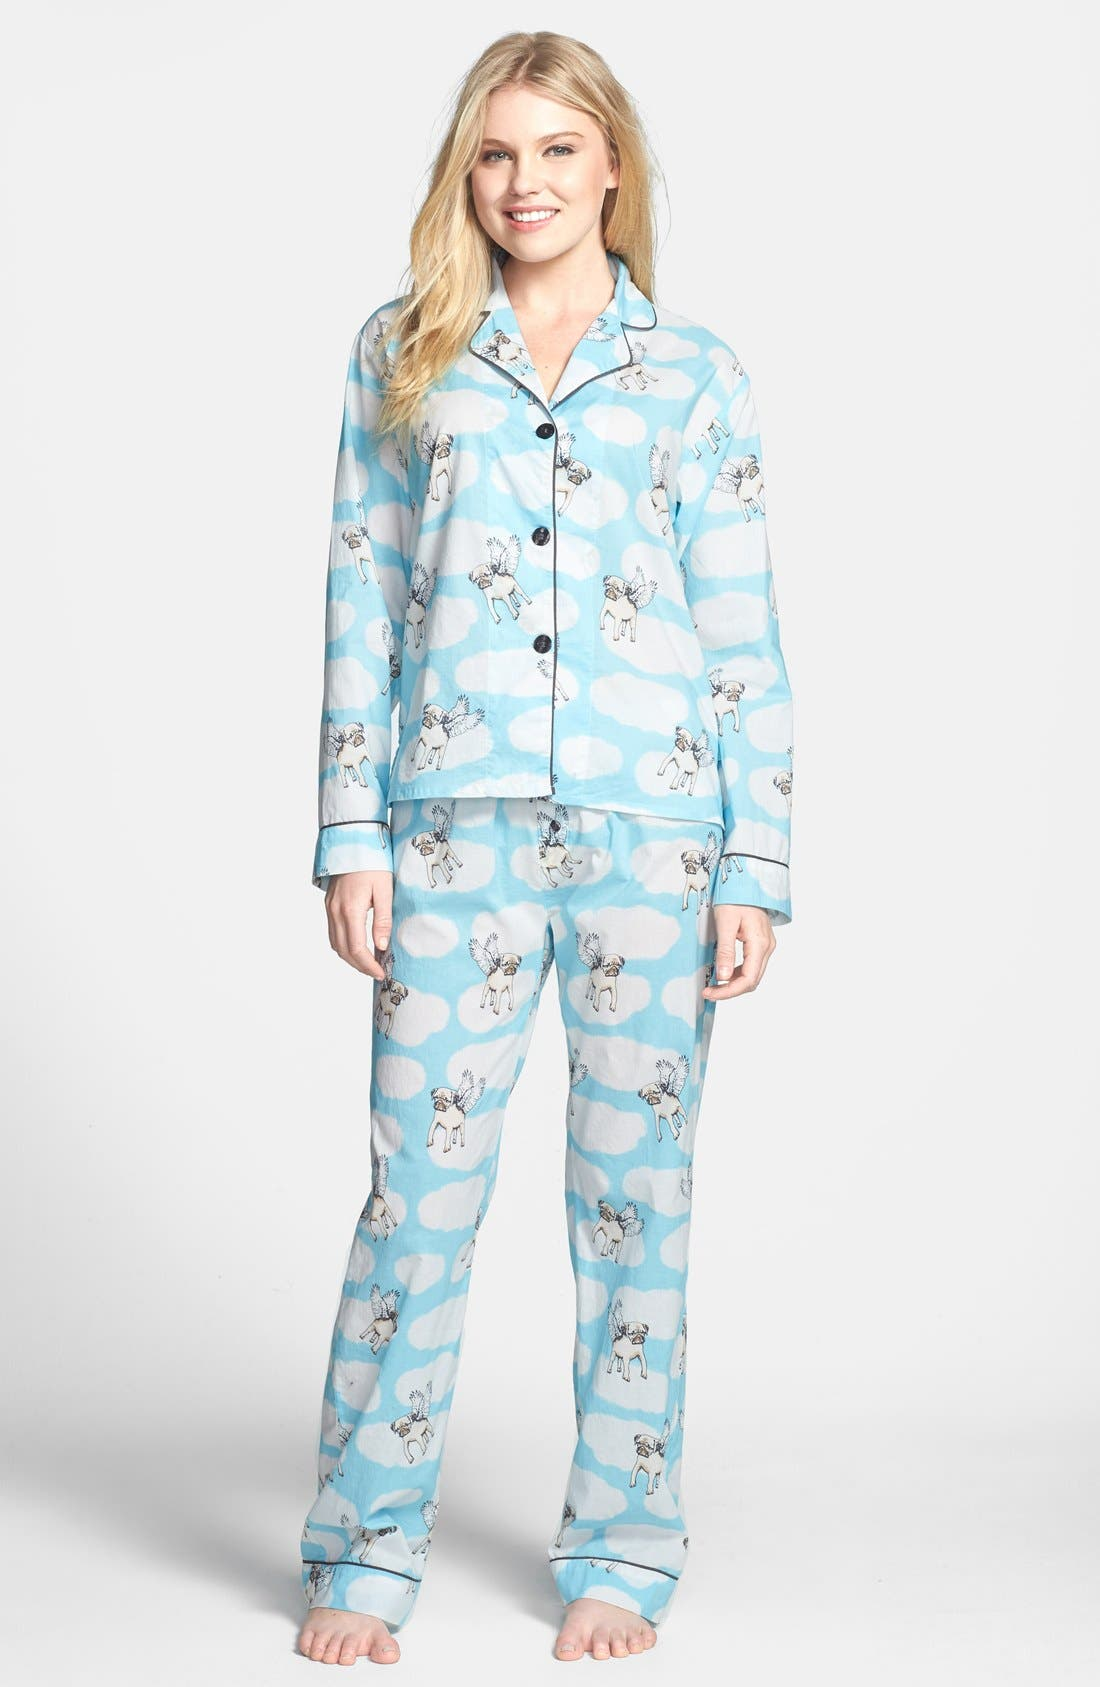 Alternate Image 1 Selected - PJ Salvage 'Playful Prints' Cotton Voile Pajamas